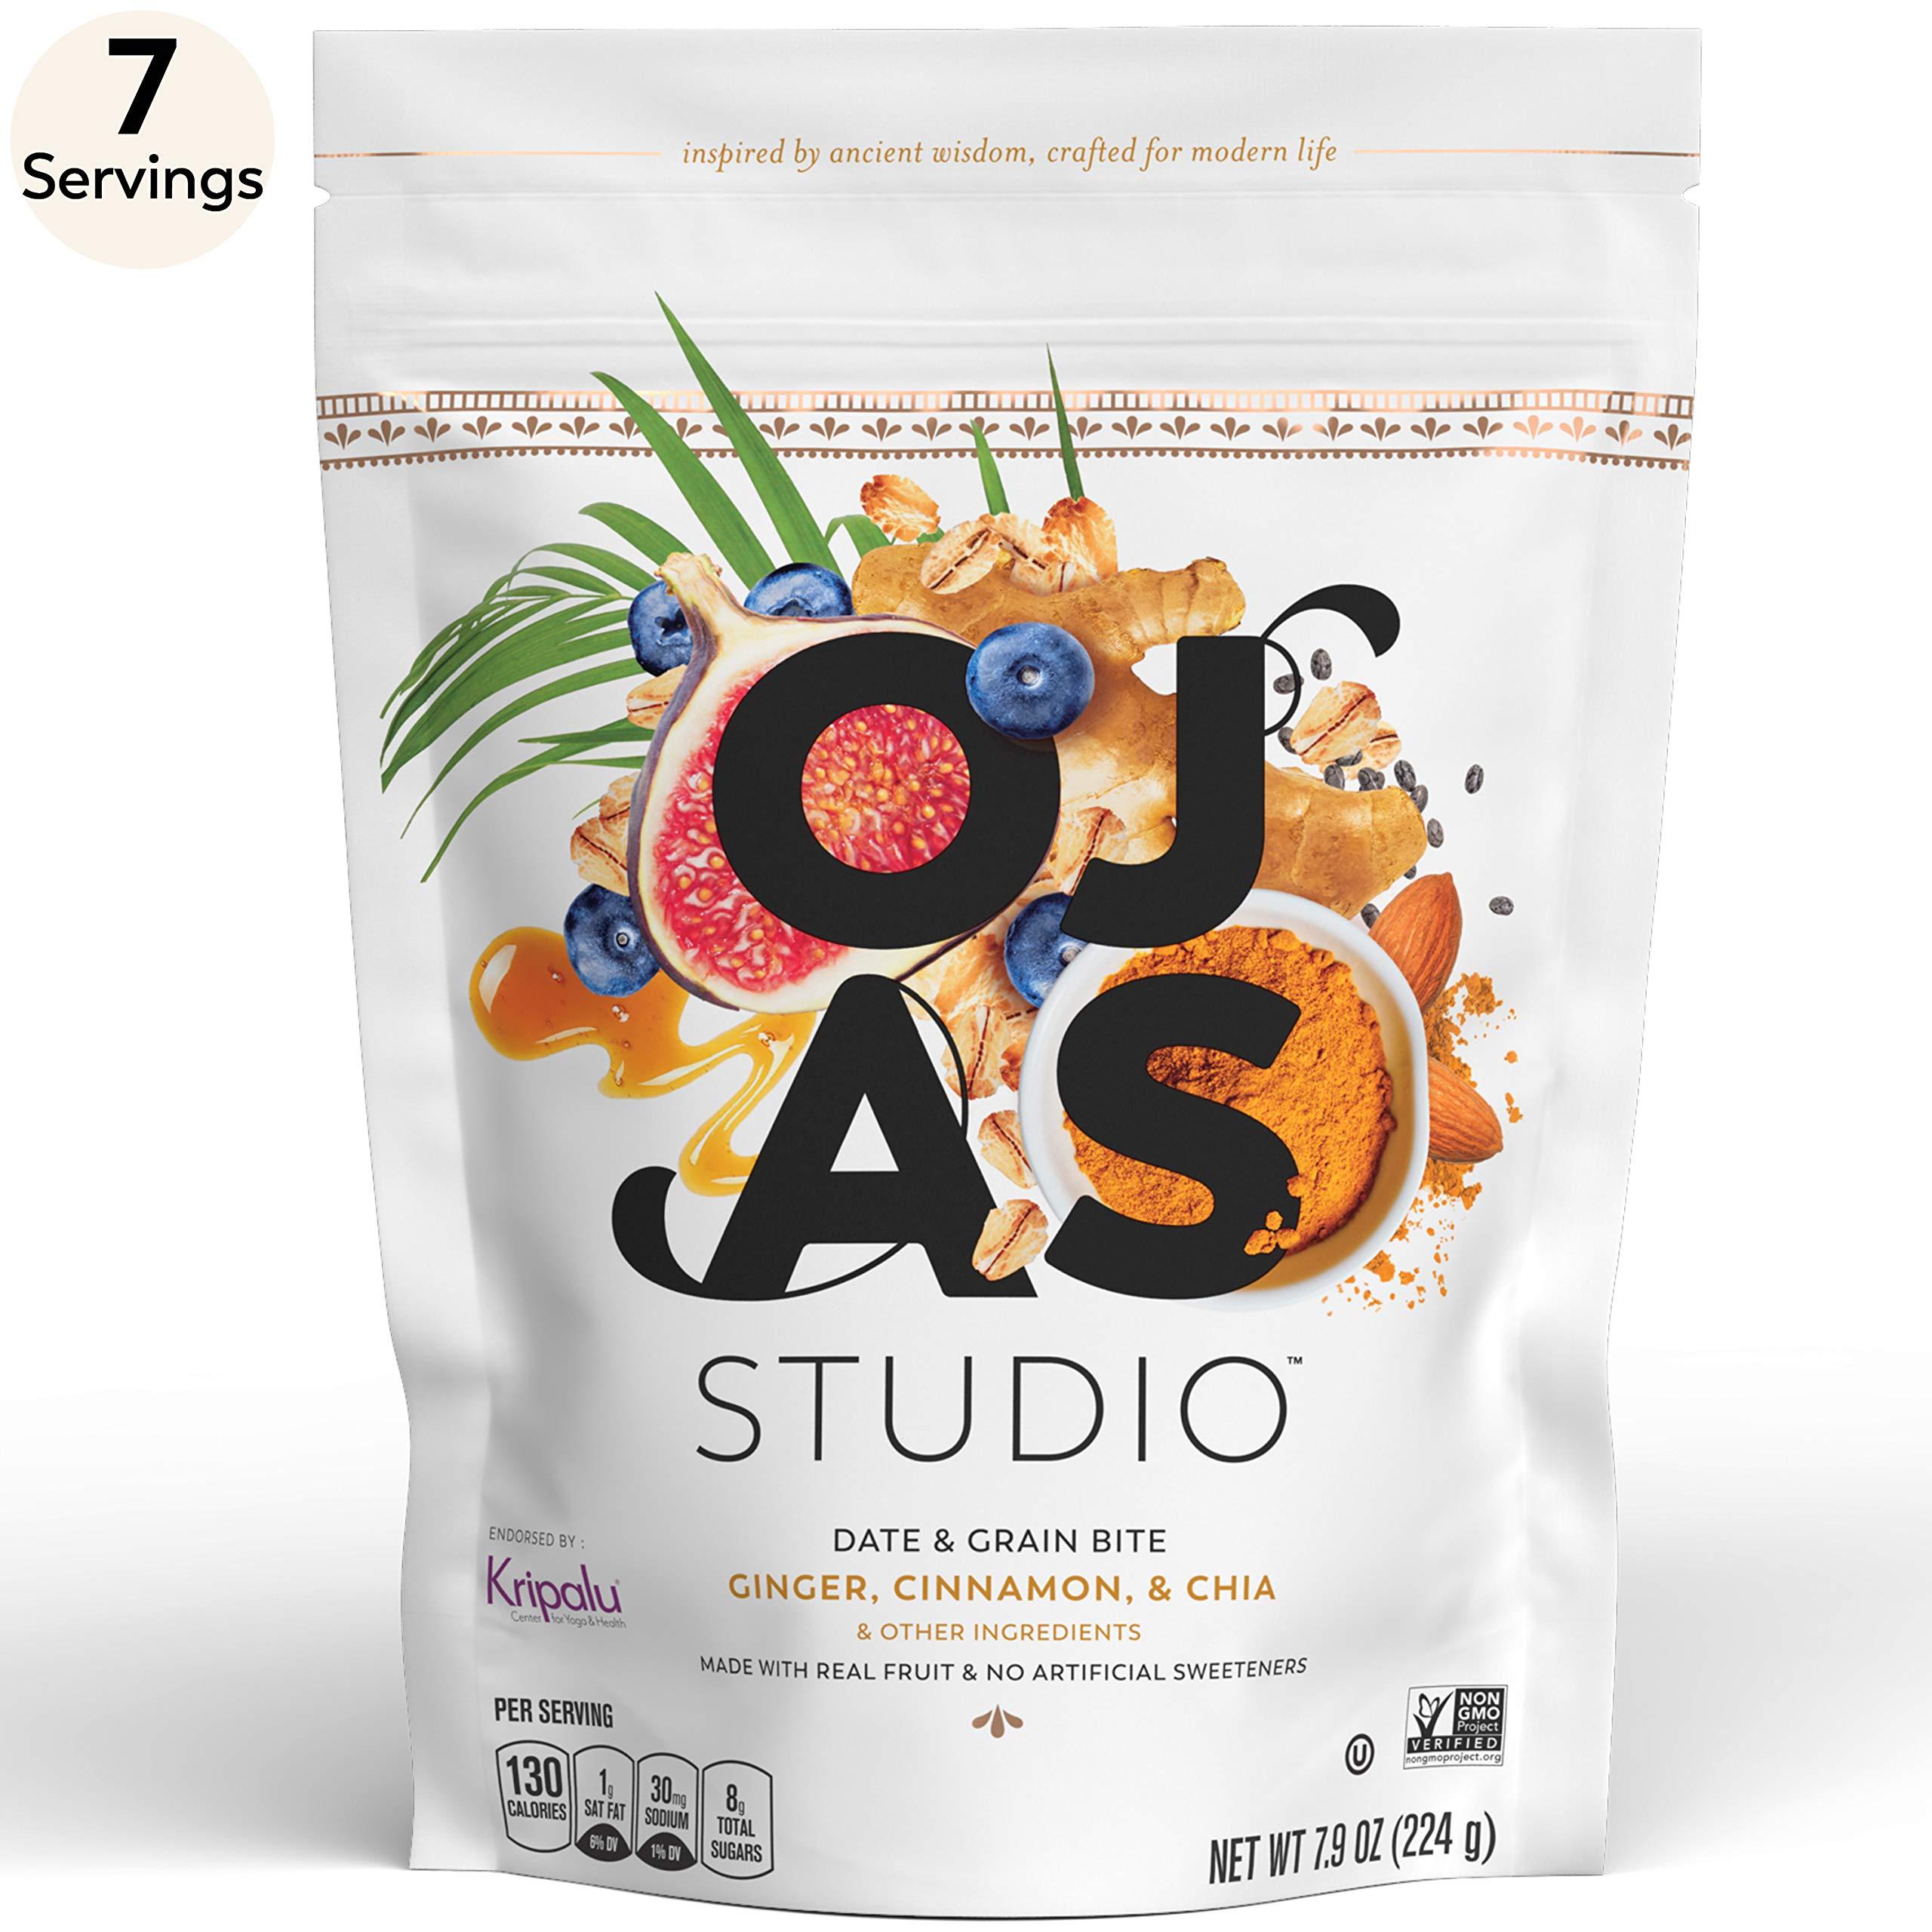 OJAS STUDIO Date & Grain Energy Bites, Ginger Cinnamon & Chia, 7-serving resealable bag, 7.9oz, non-GMO, no artificial sweeteners by Ojas Studio